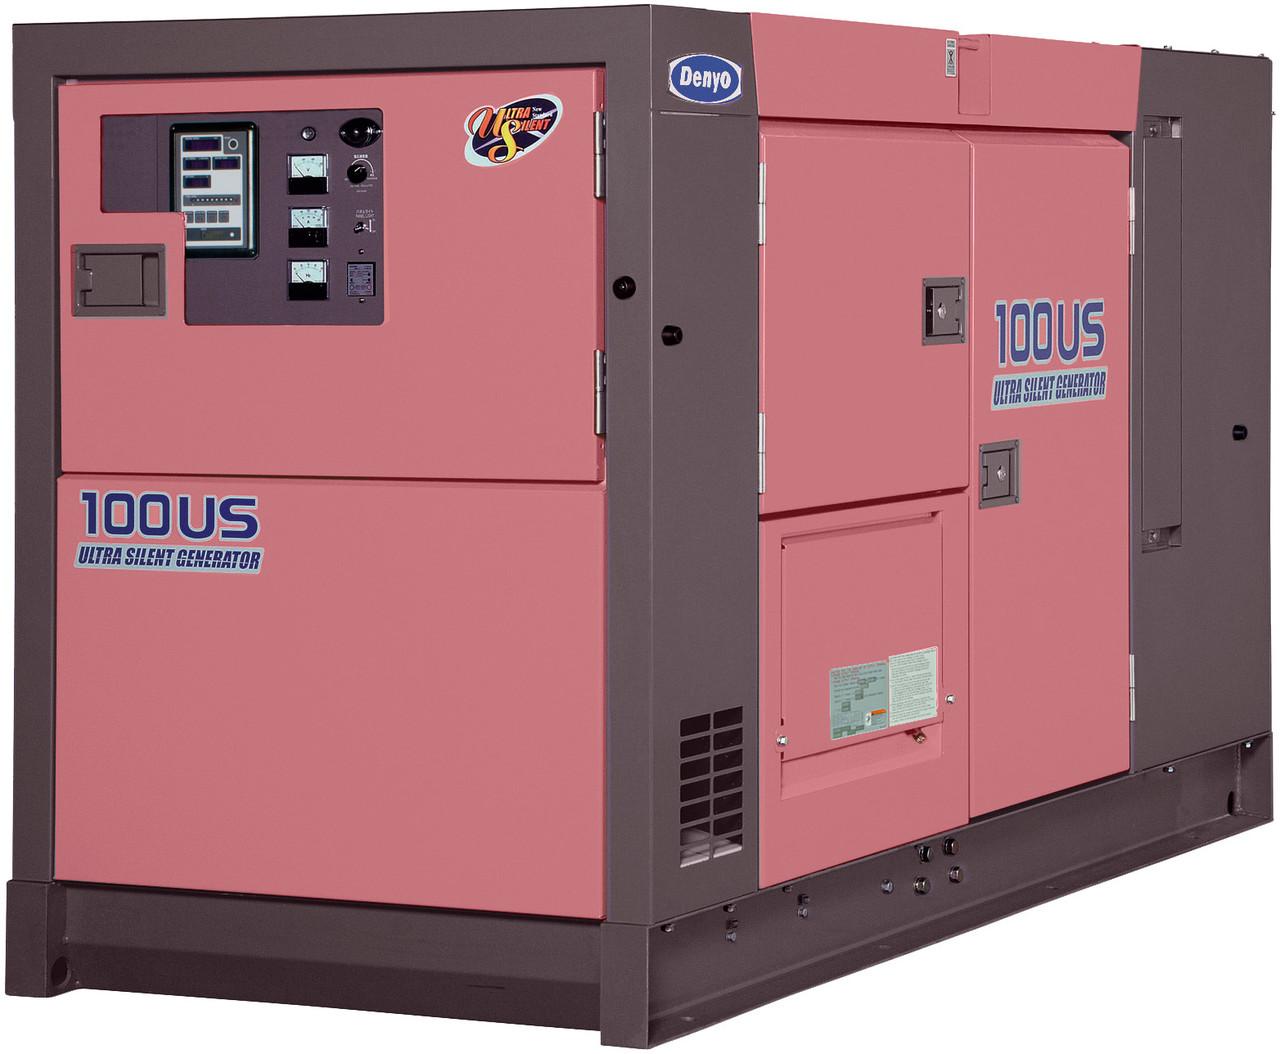 DENYO 100KVA Diesel Generator - 3 Phase - DCA-100USI - Ultra Silenced